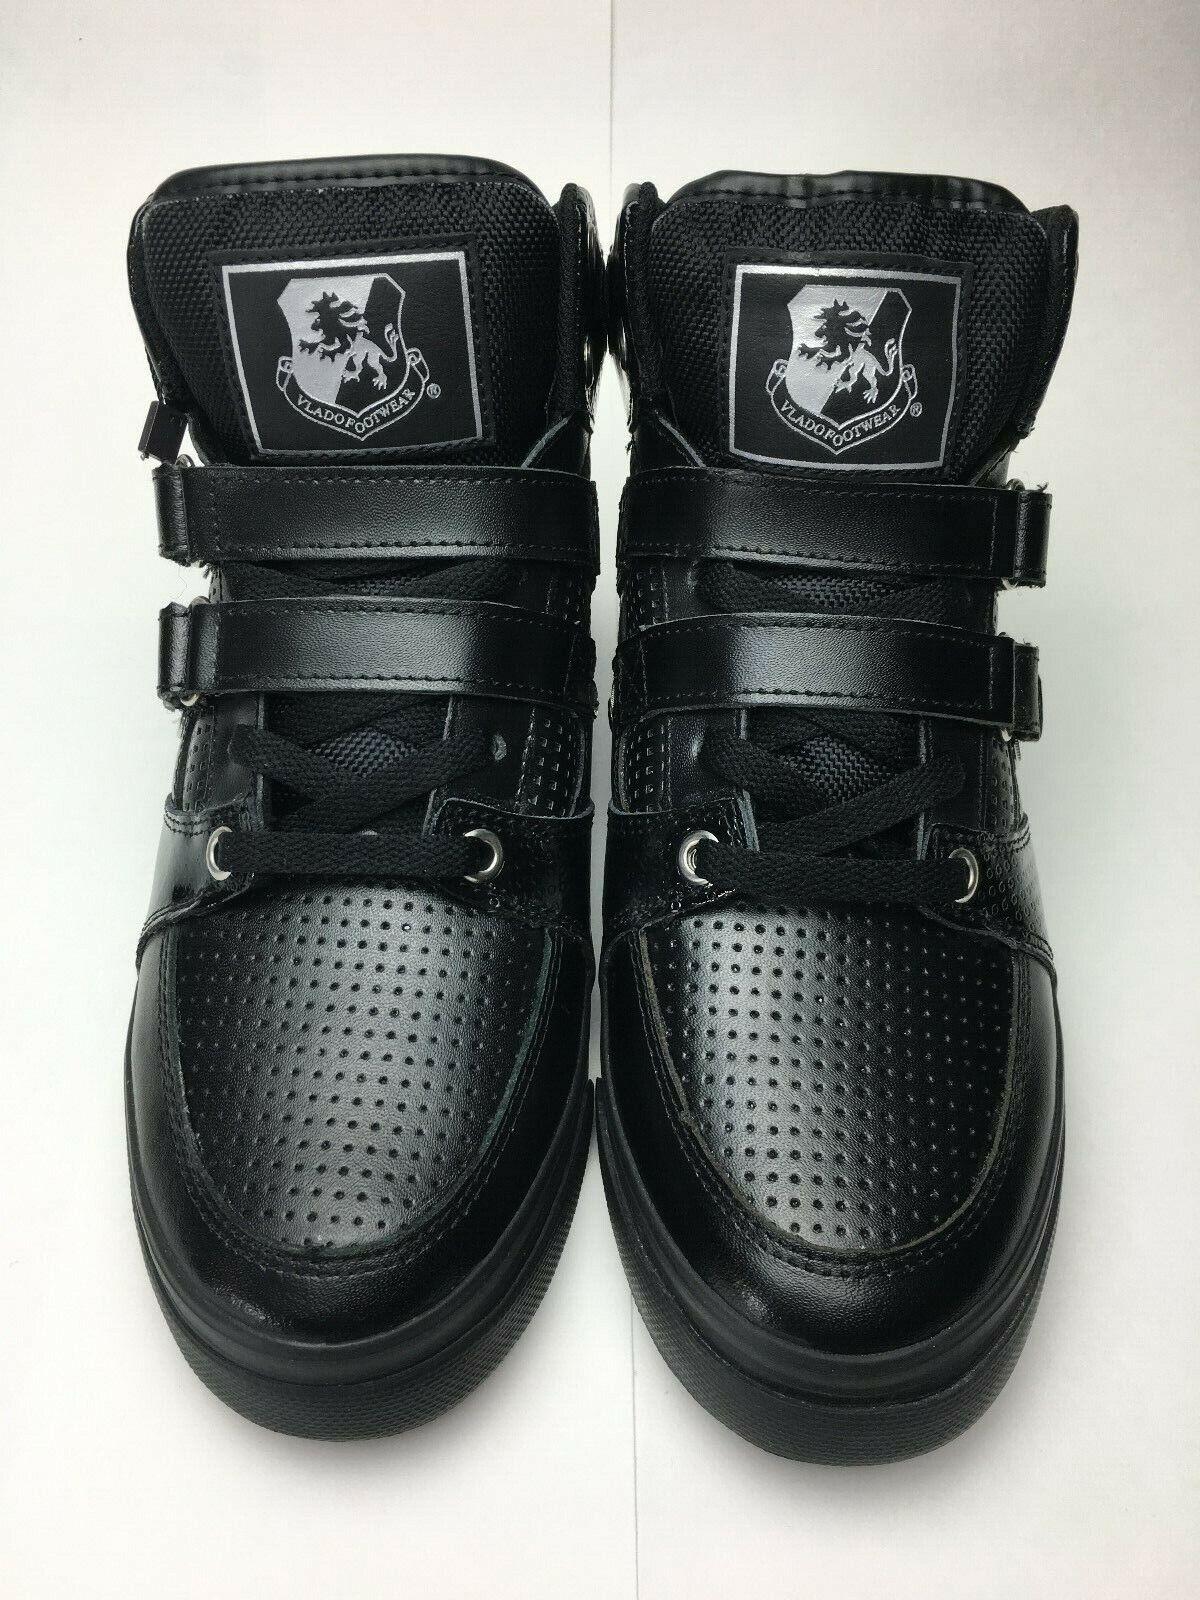 Wouomo Vlado Eversole Leather Footwear scarpe Knight IG 1160 V201 Dimensione 7